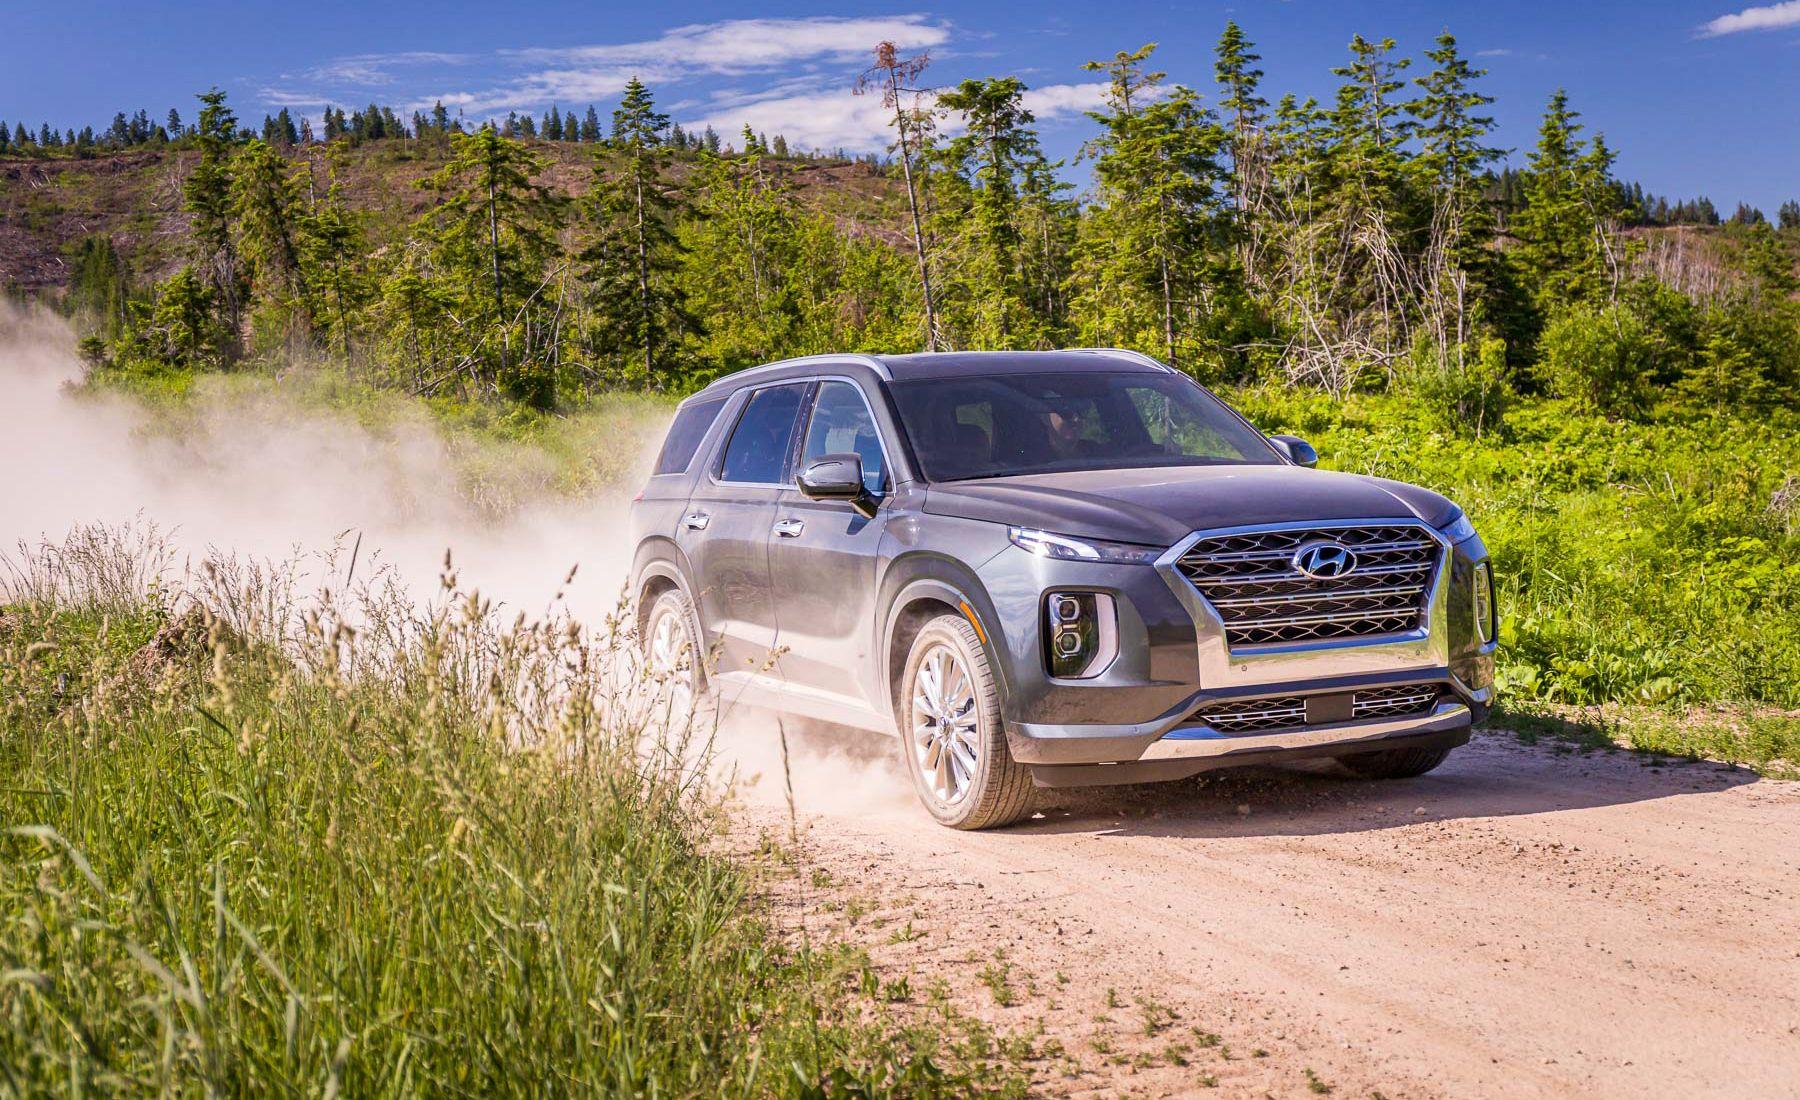 2020 Hyundai Palisade Review - Details, Specs